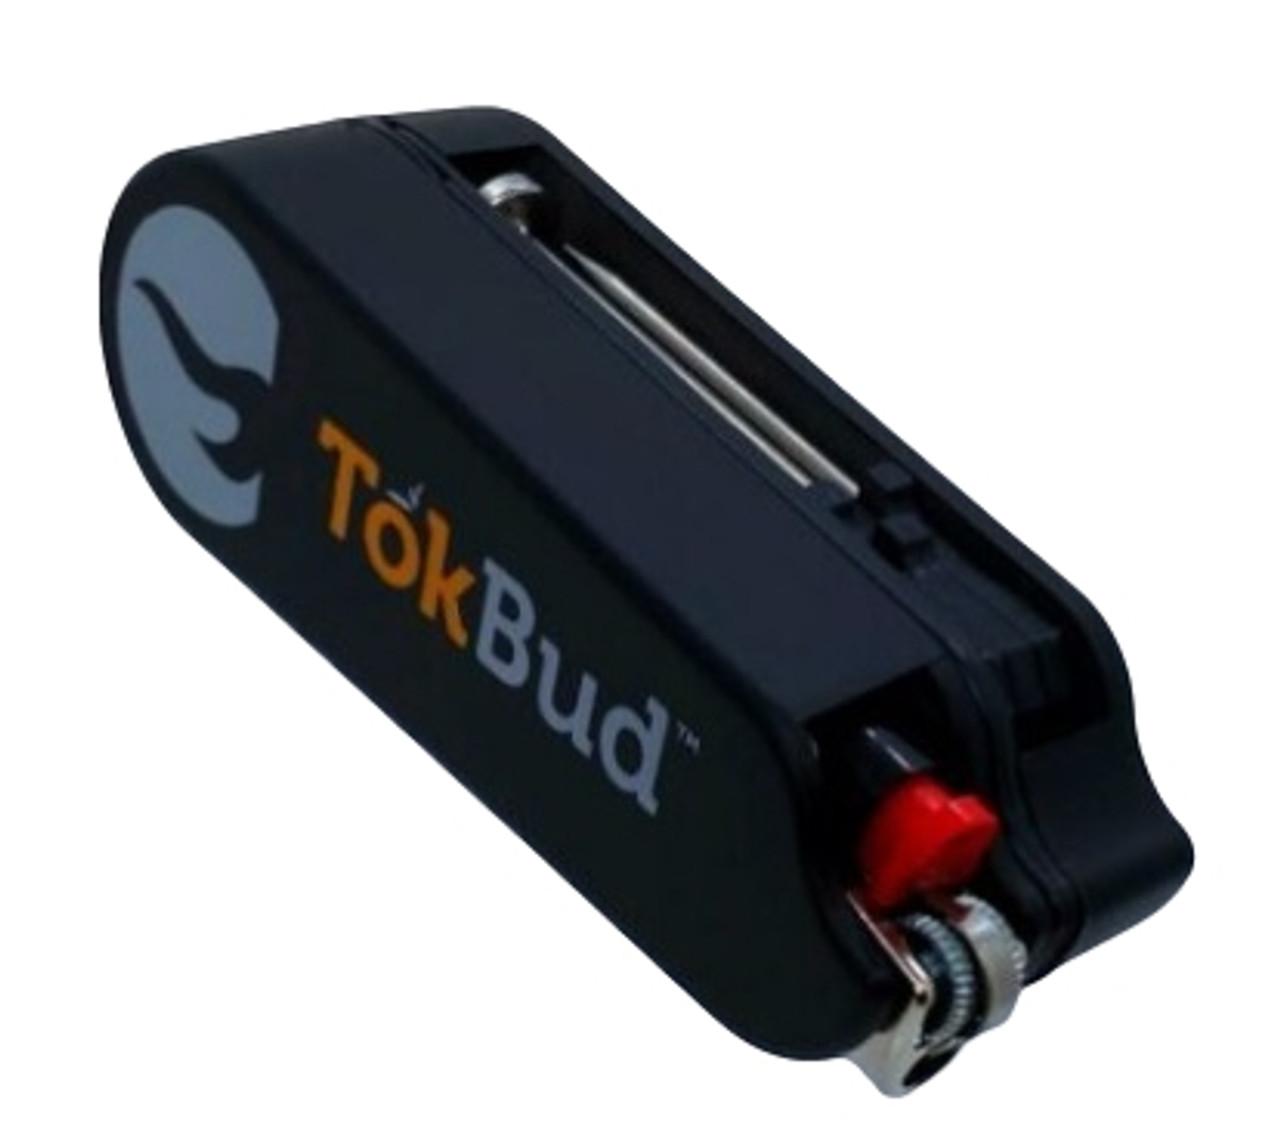 TōkBud™ Ultimate Smoker Utility Tool